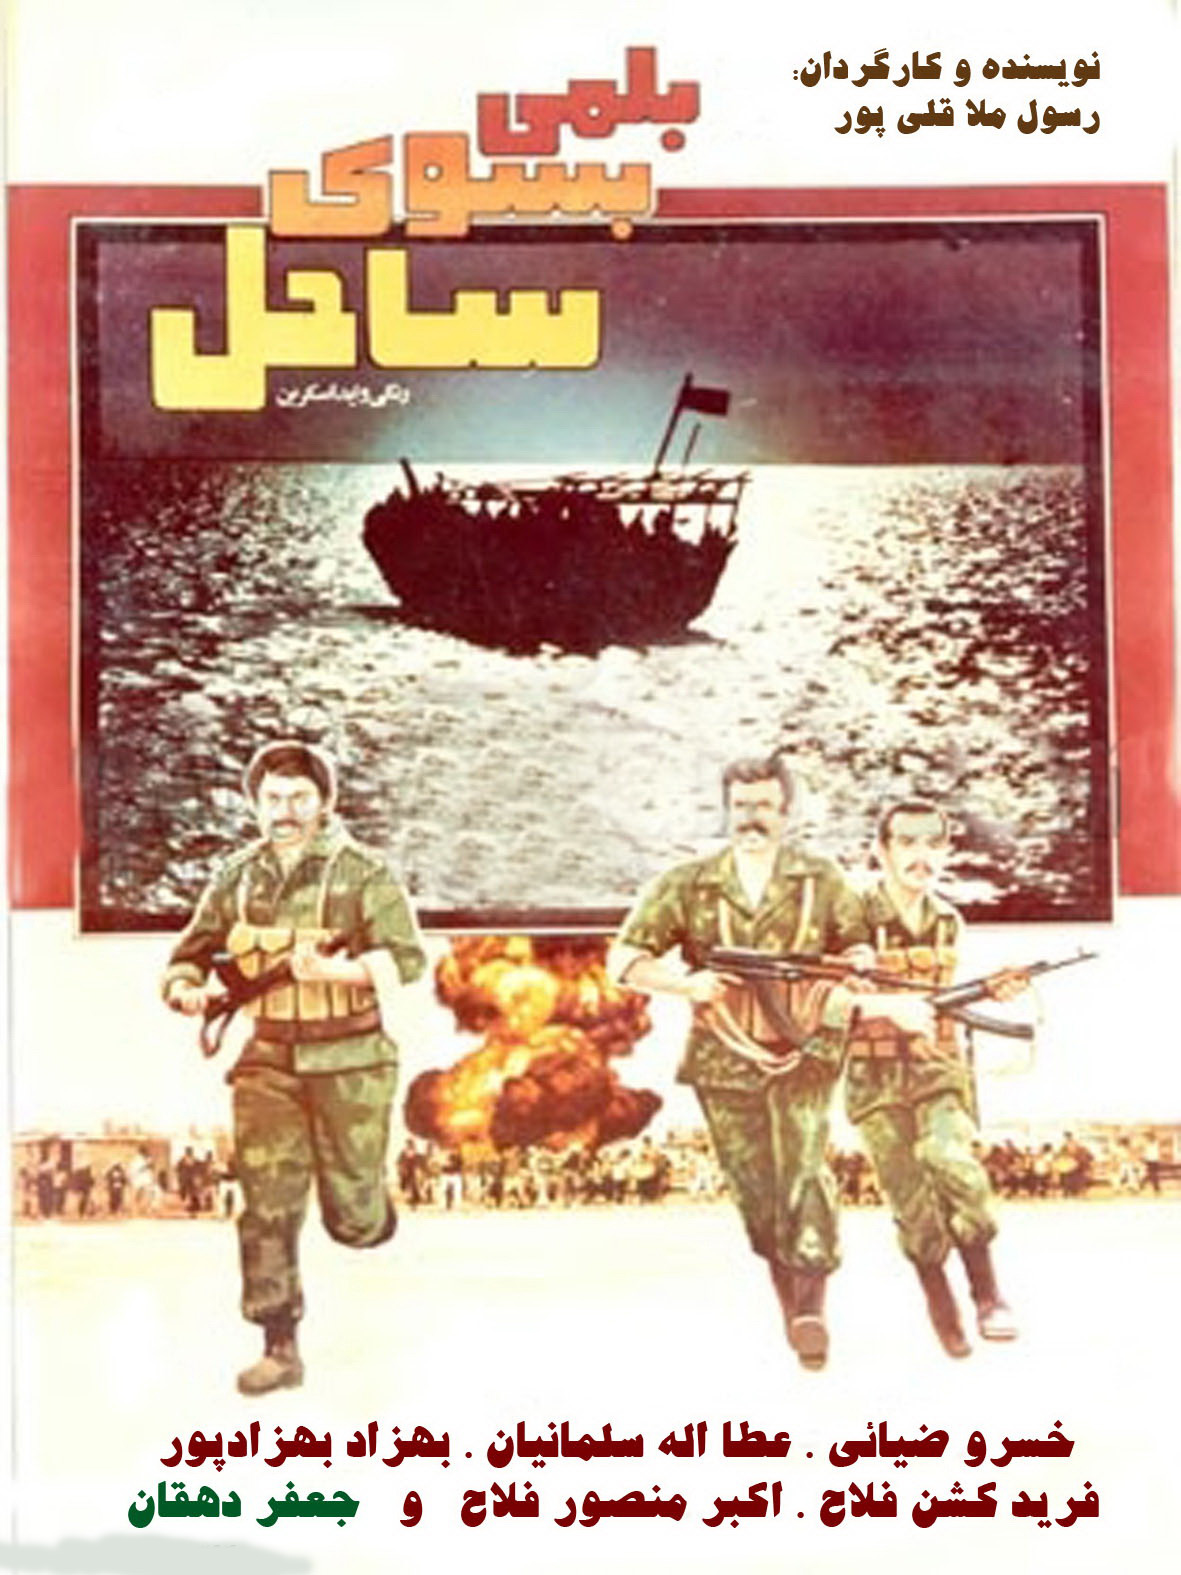 Balami be soo-ye sahel ((1986))